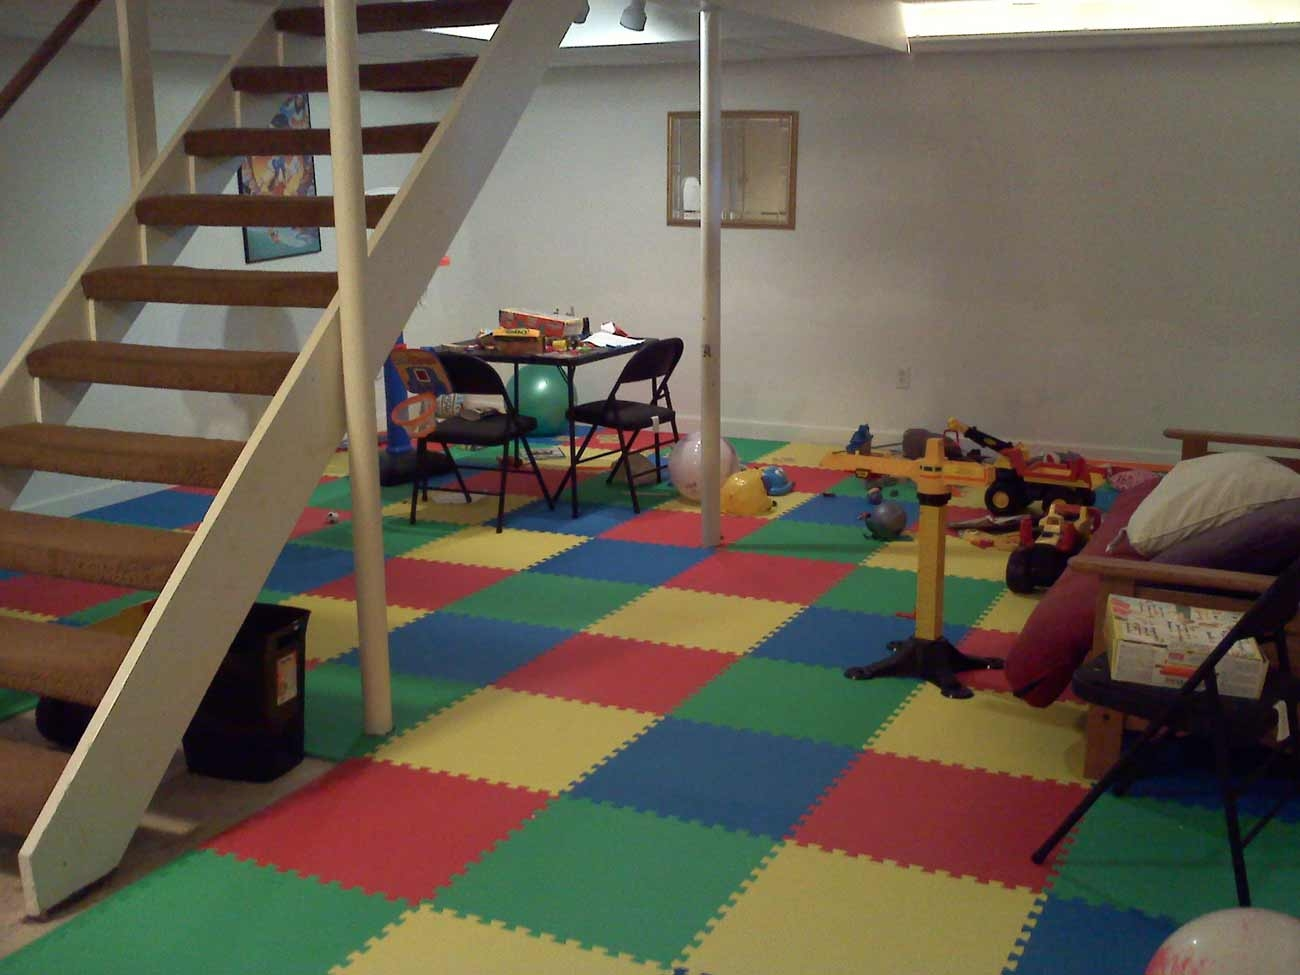 Best Flooring For Basement Playroom